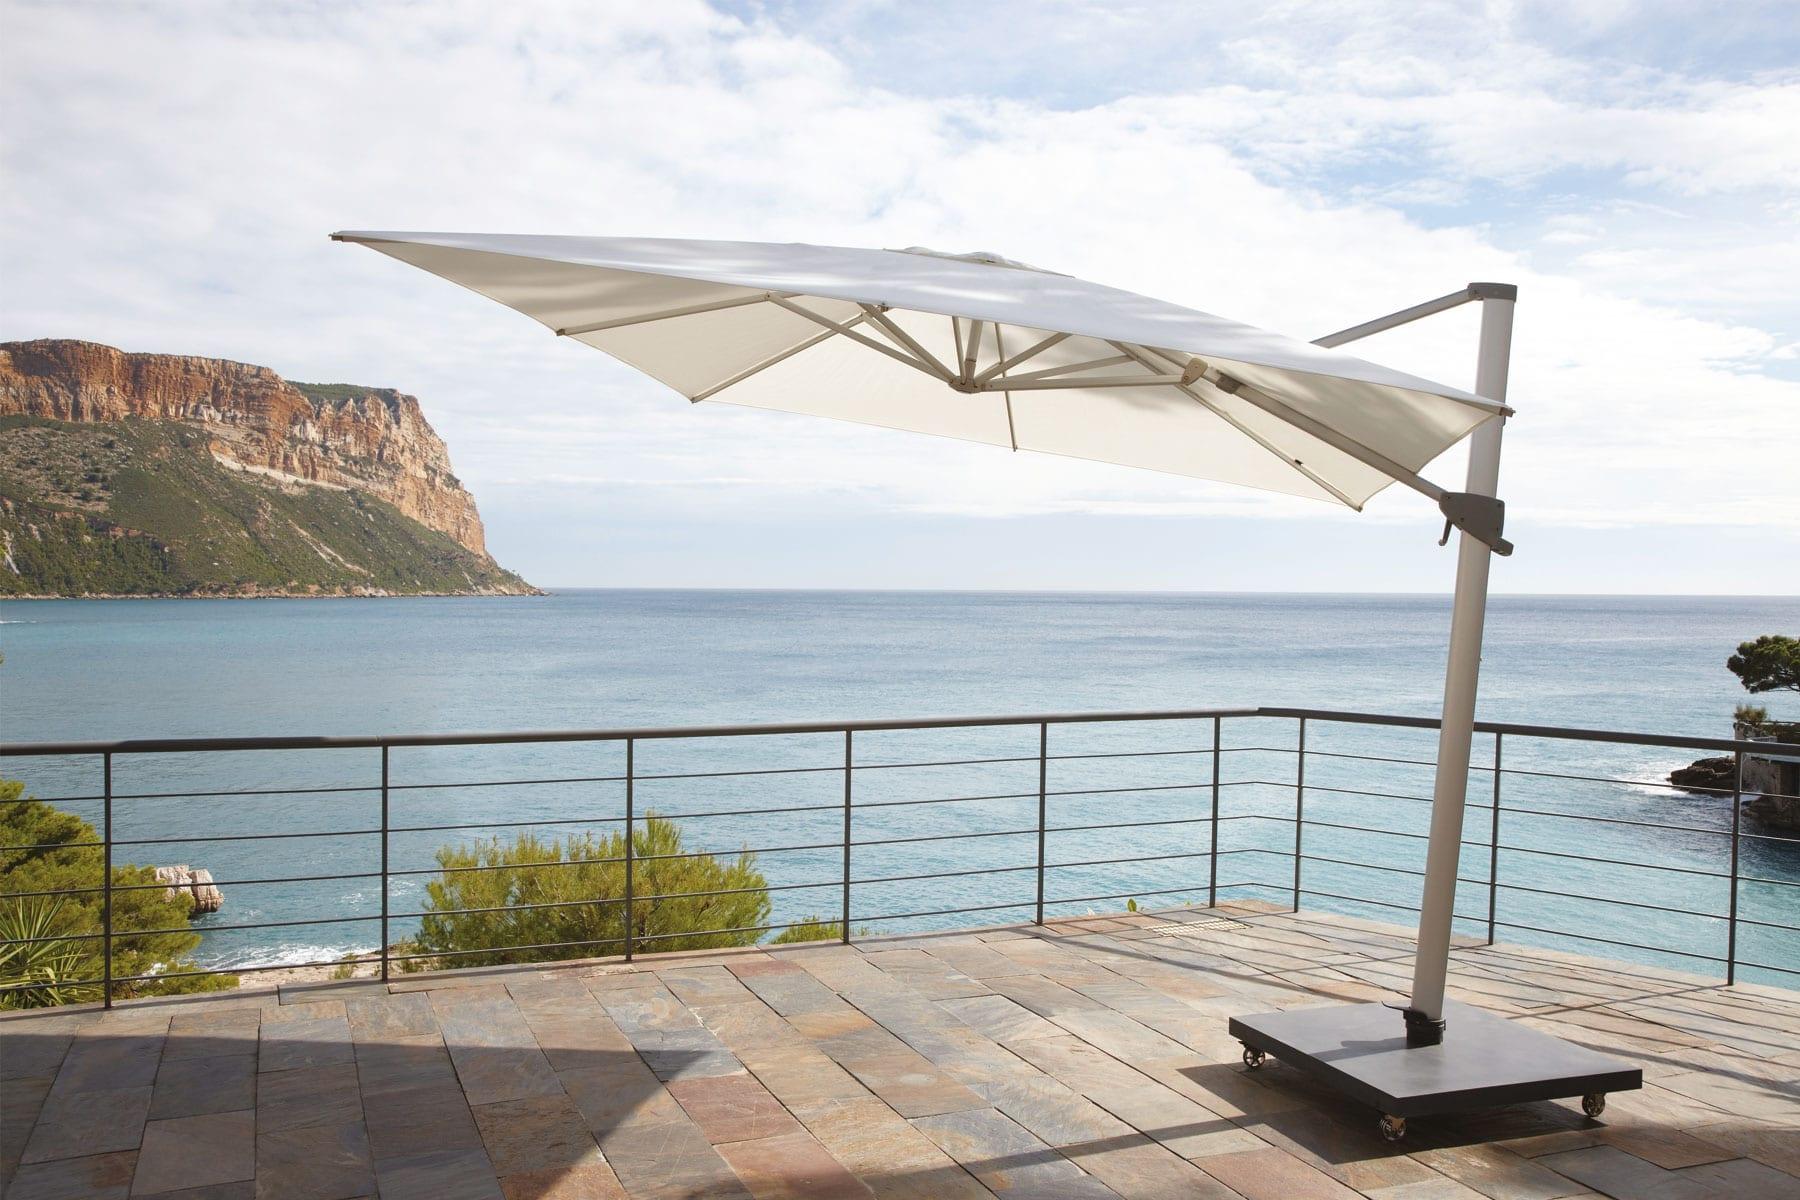 aspen-umbrella Incroyable De Parasol Sur Pied Schème